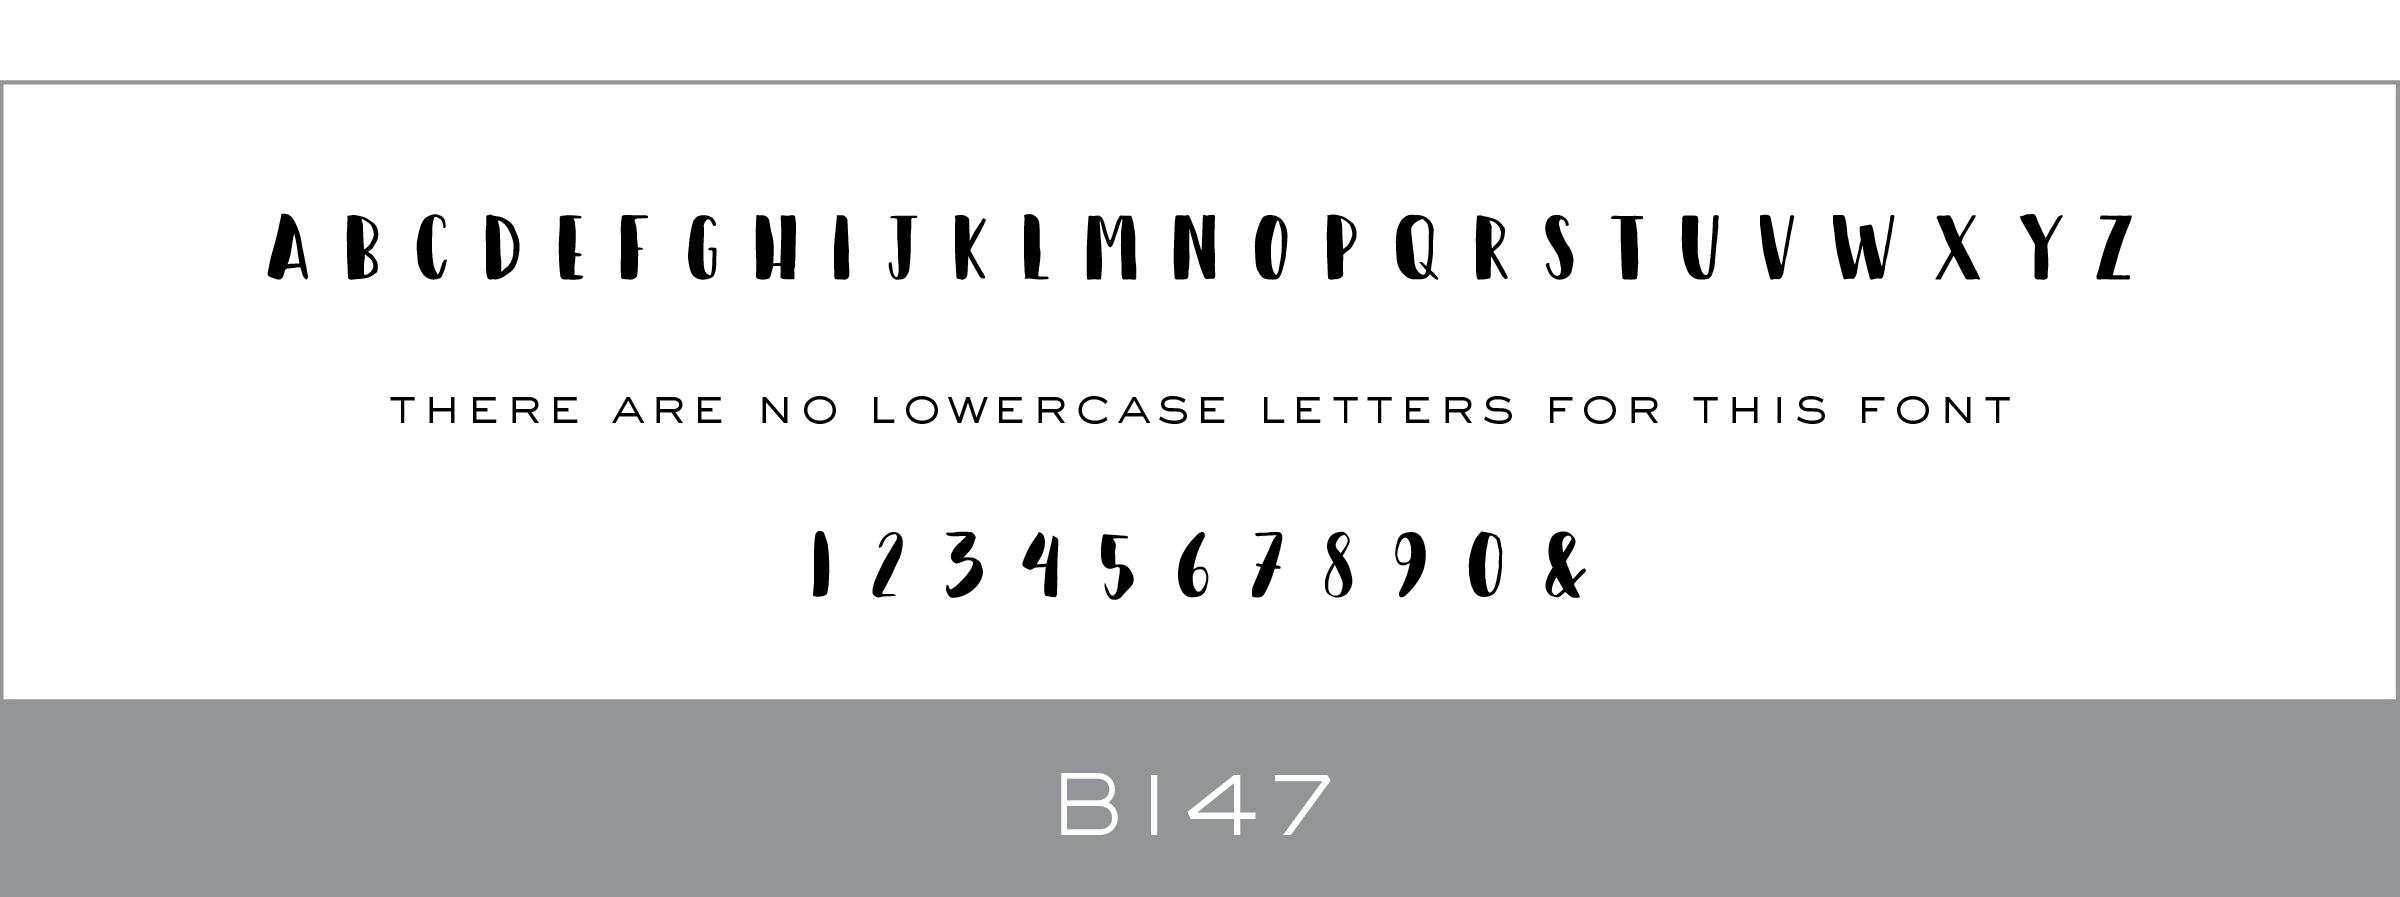 B147_Haute_Papier_Font.jpg